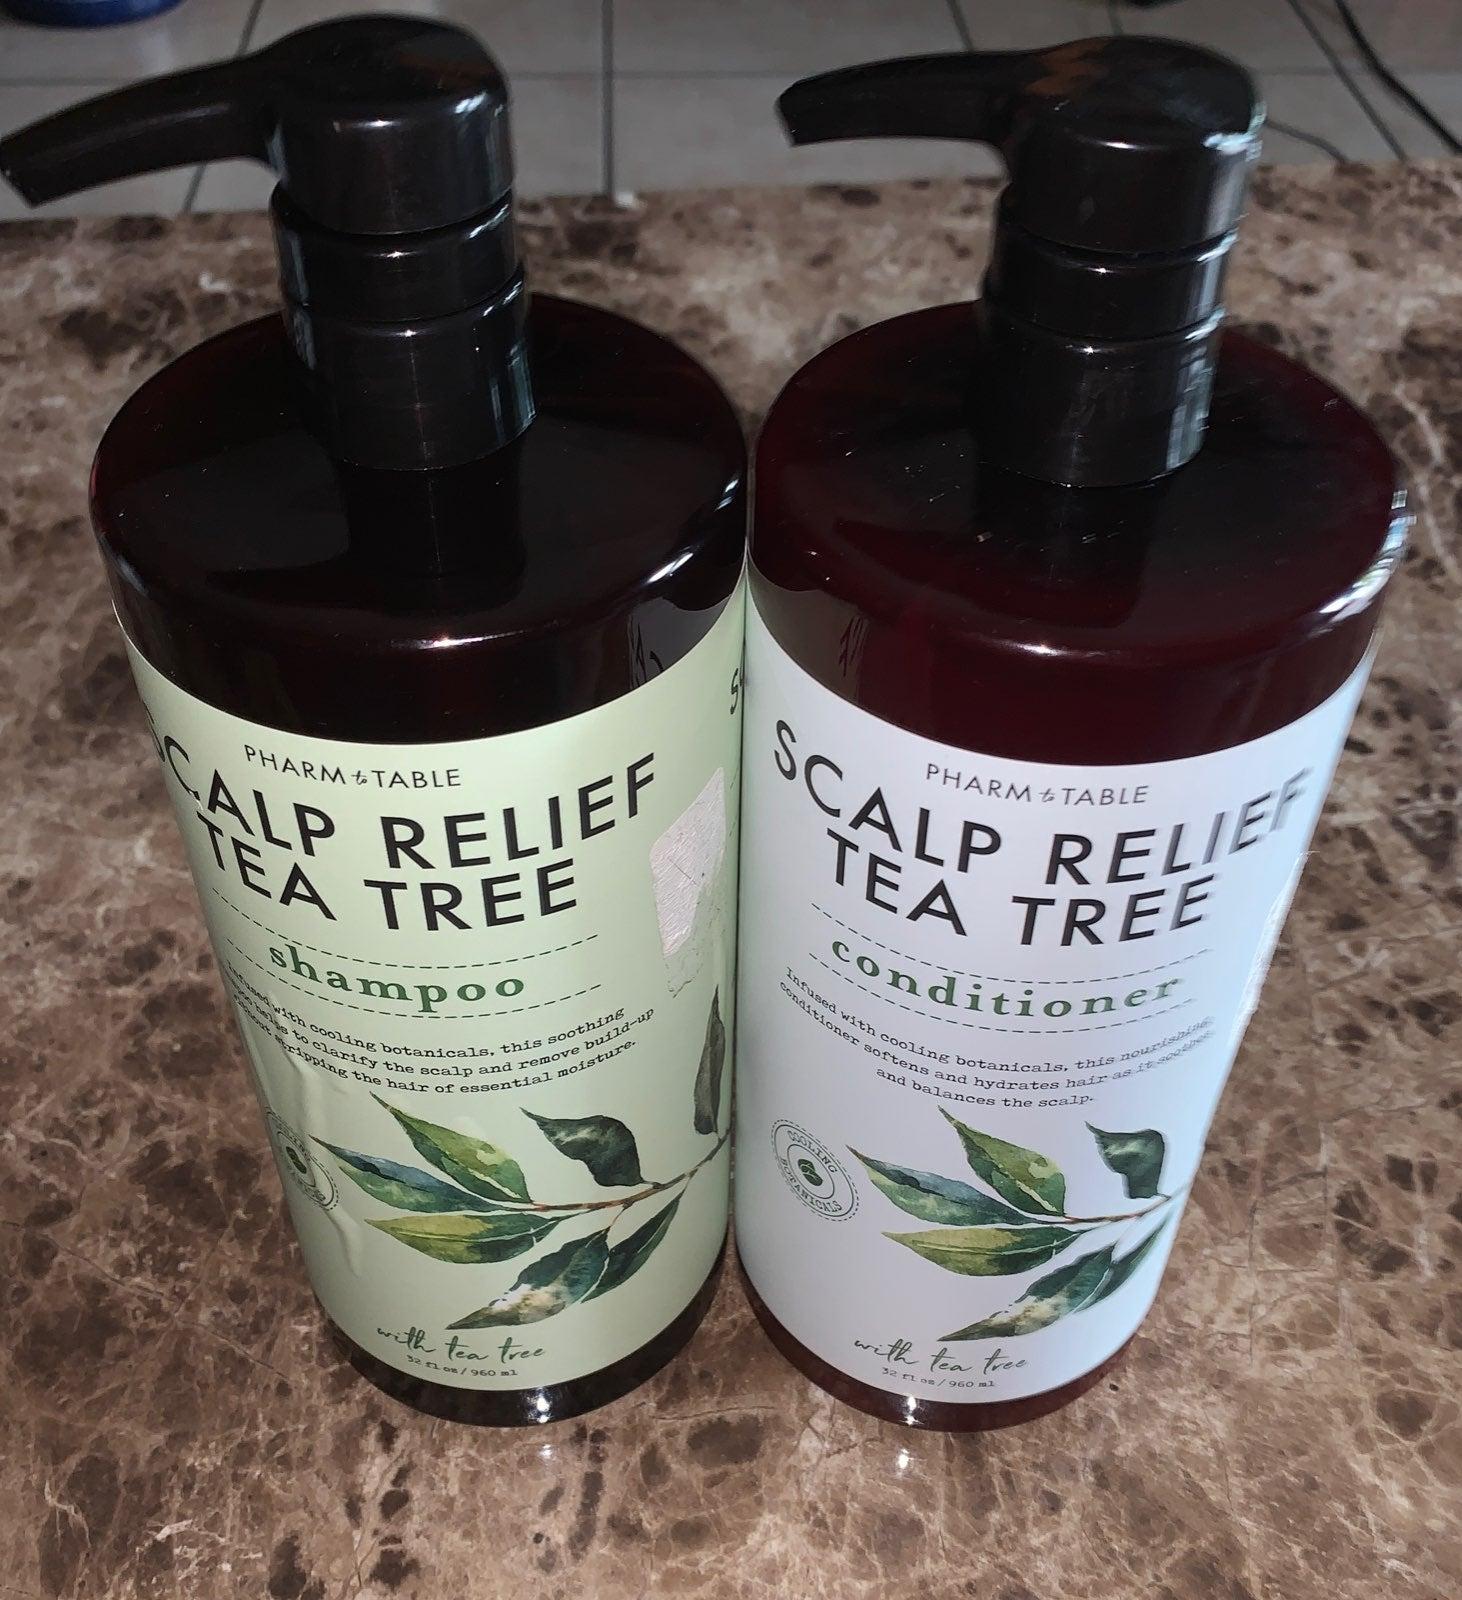 Scalf Relief Tea Tree